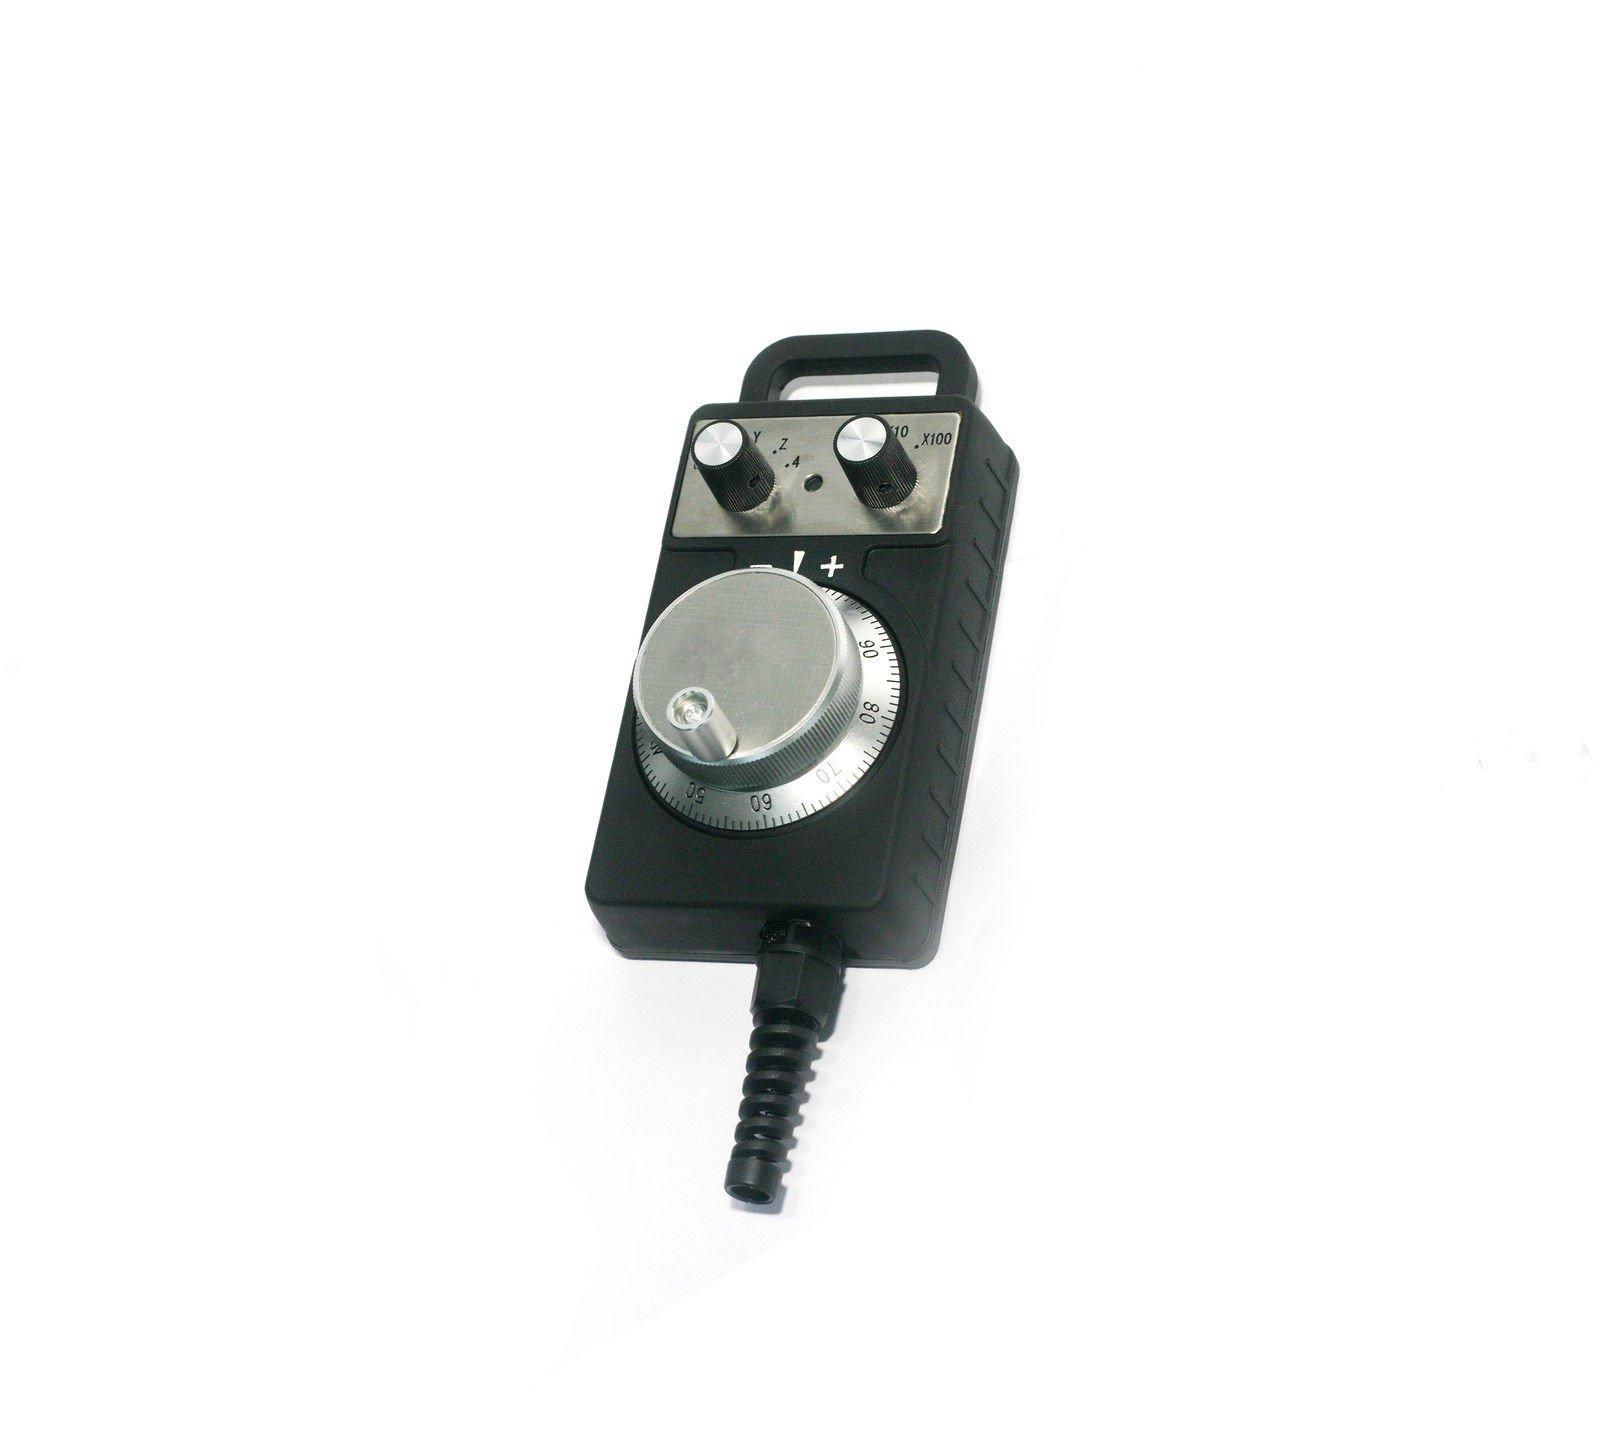 Handy Pulser MPG Handwheel 4 Axis DC5-15V 100PPR Emergency Stop Enabling Switch